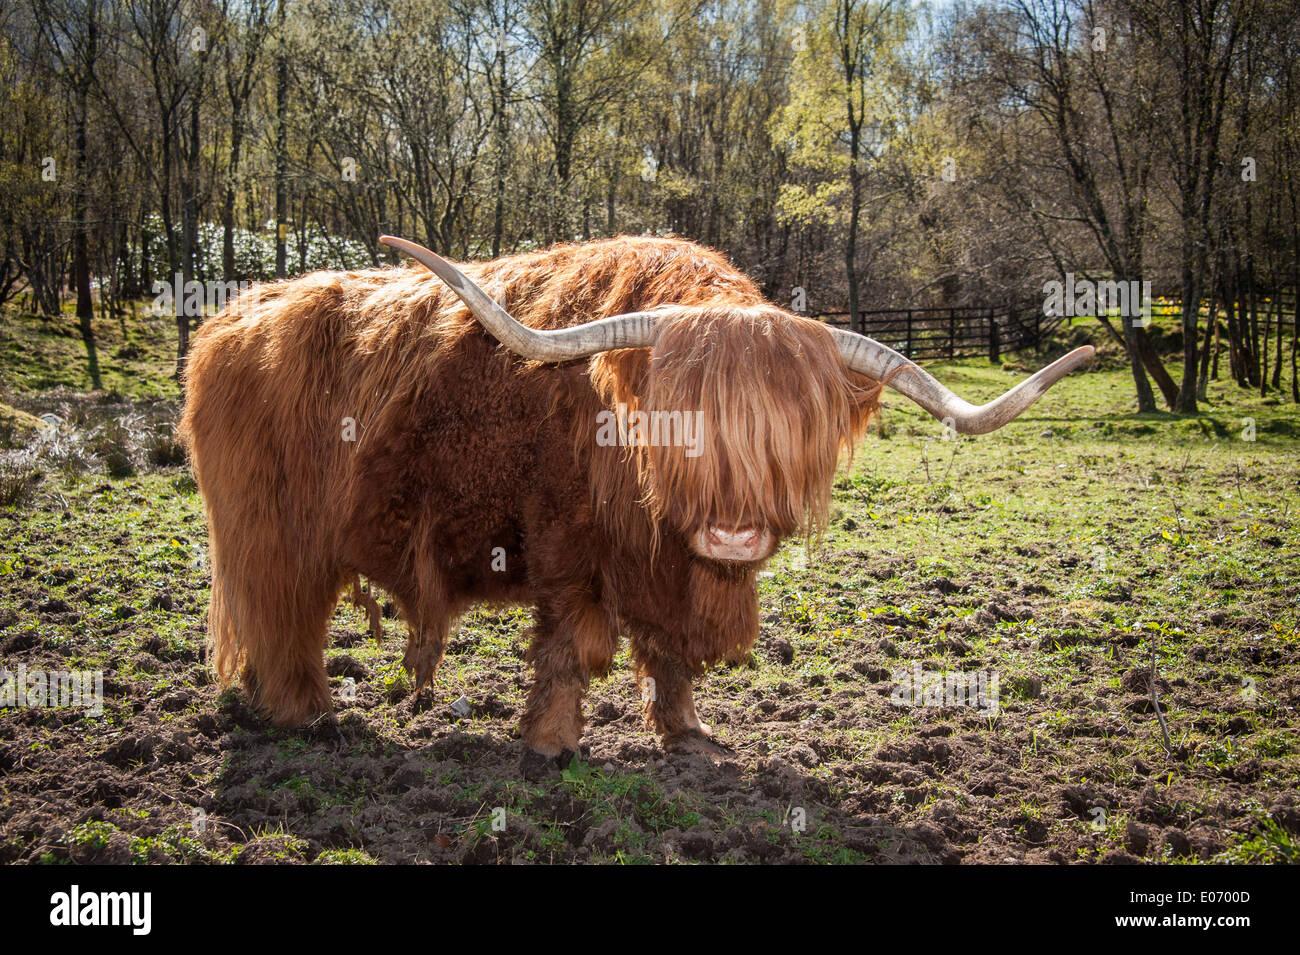 Highland Cow, Scotland - Stock Image